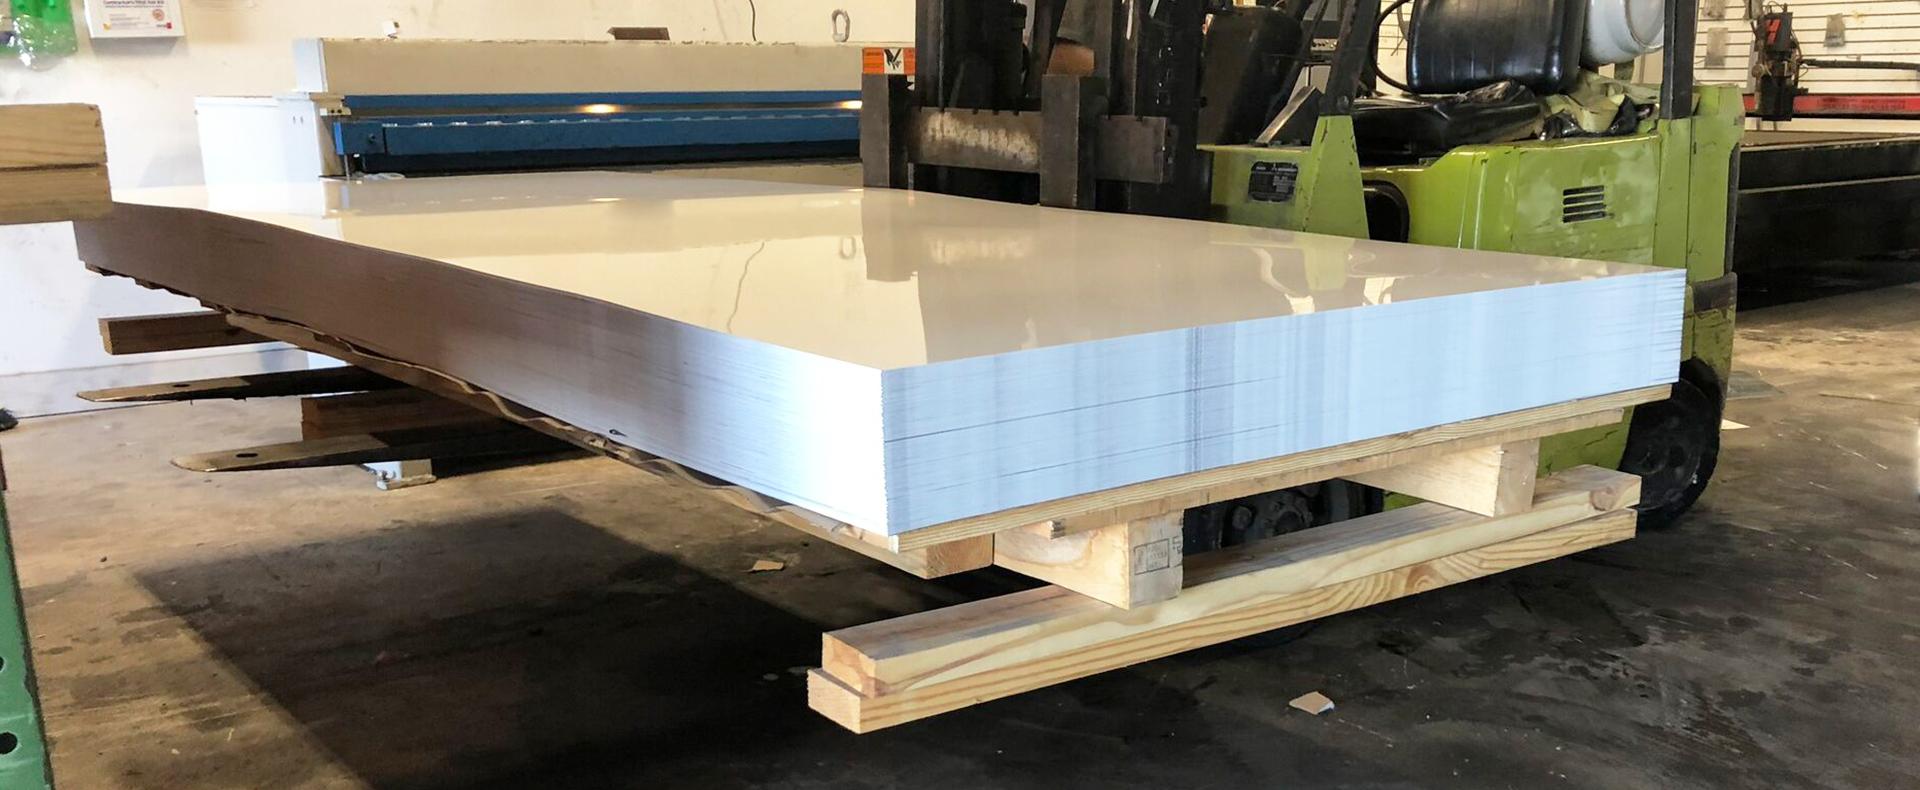 roofing sheet metal fabricator fort lauderdale